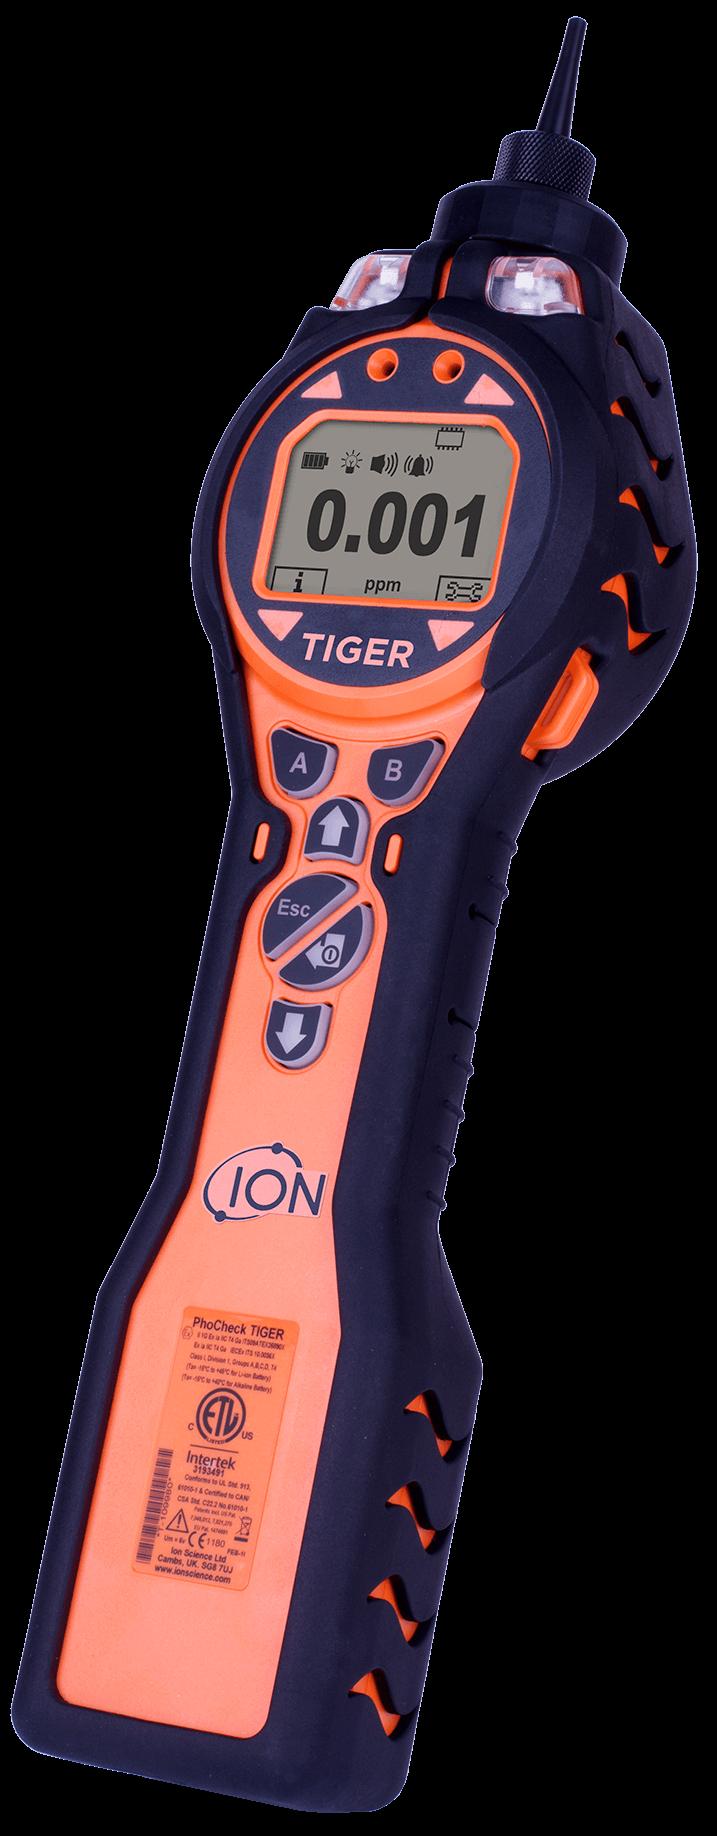 PhoCheck Tiger 虎牌有机气体检测仪